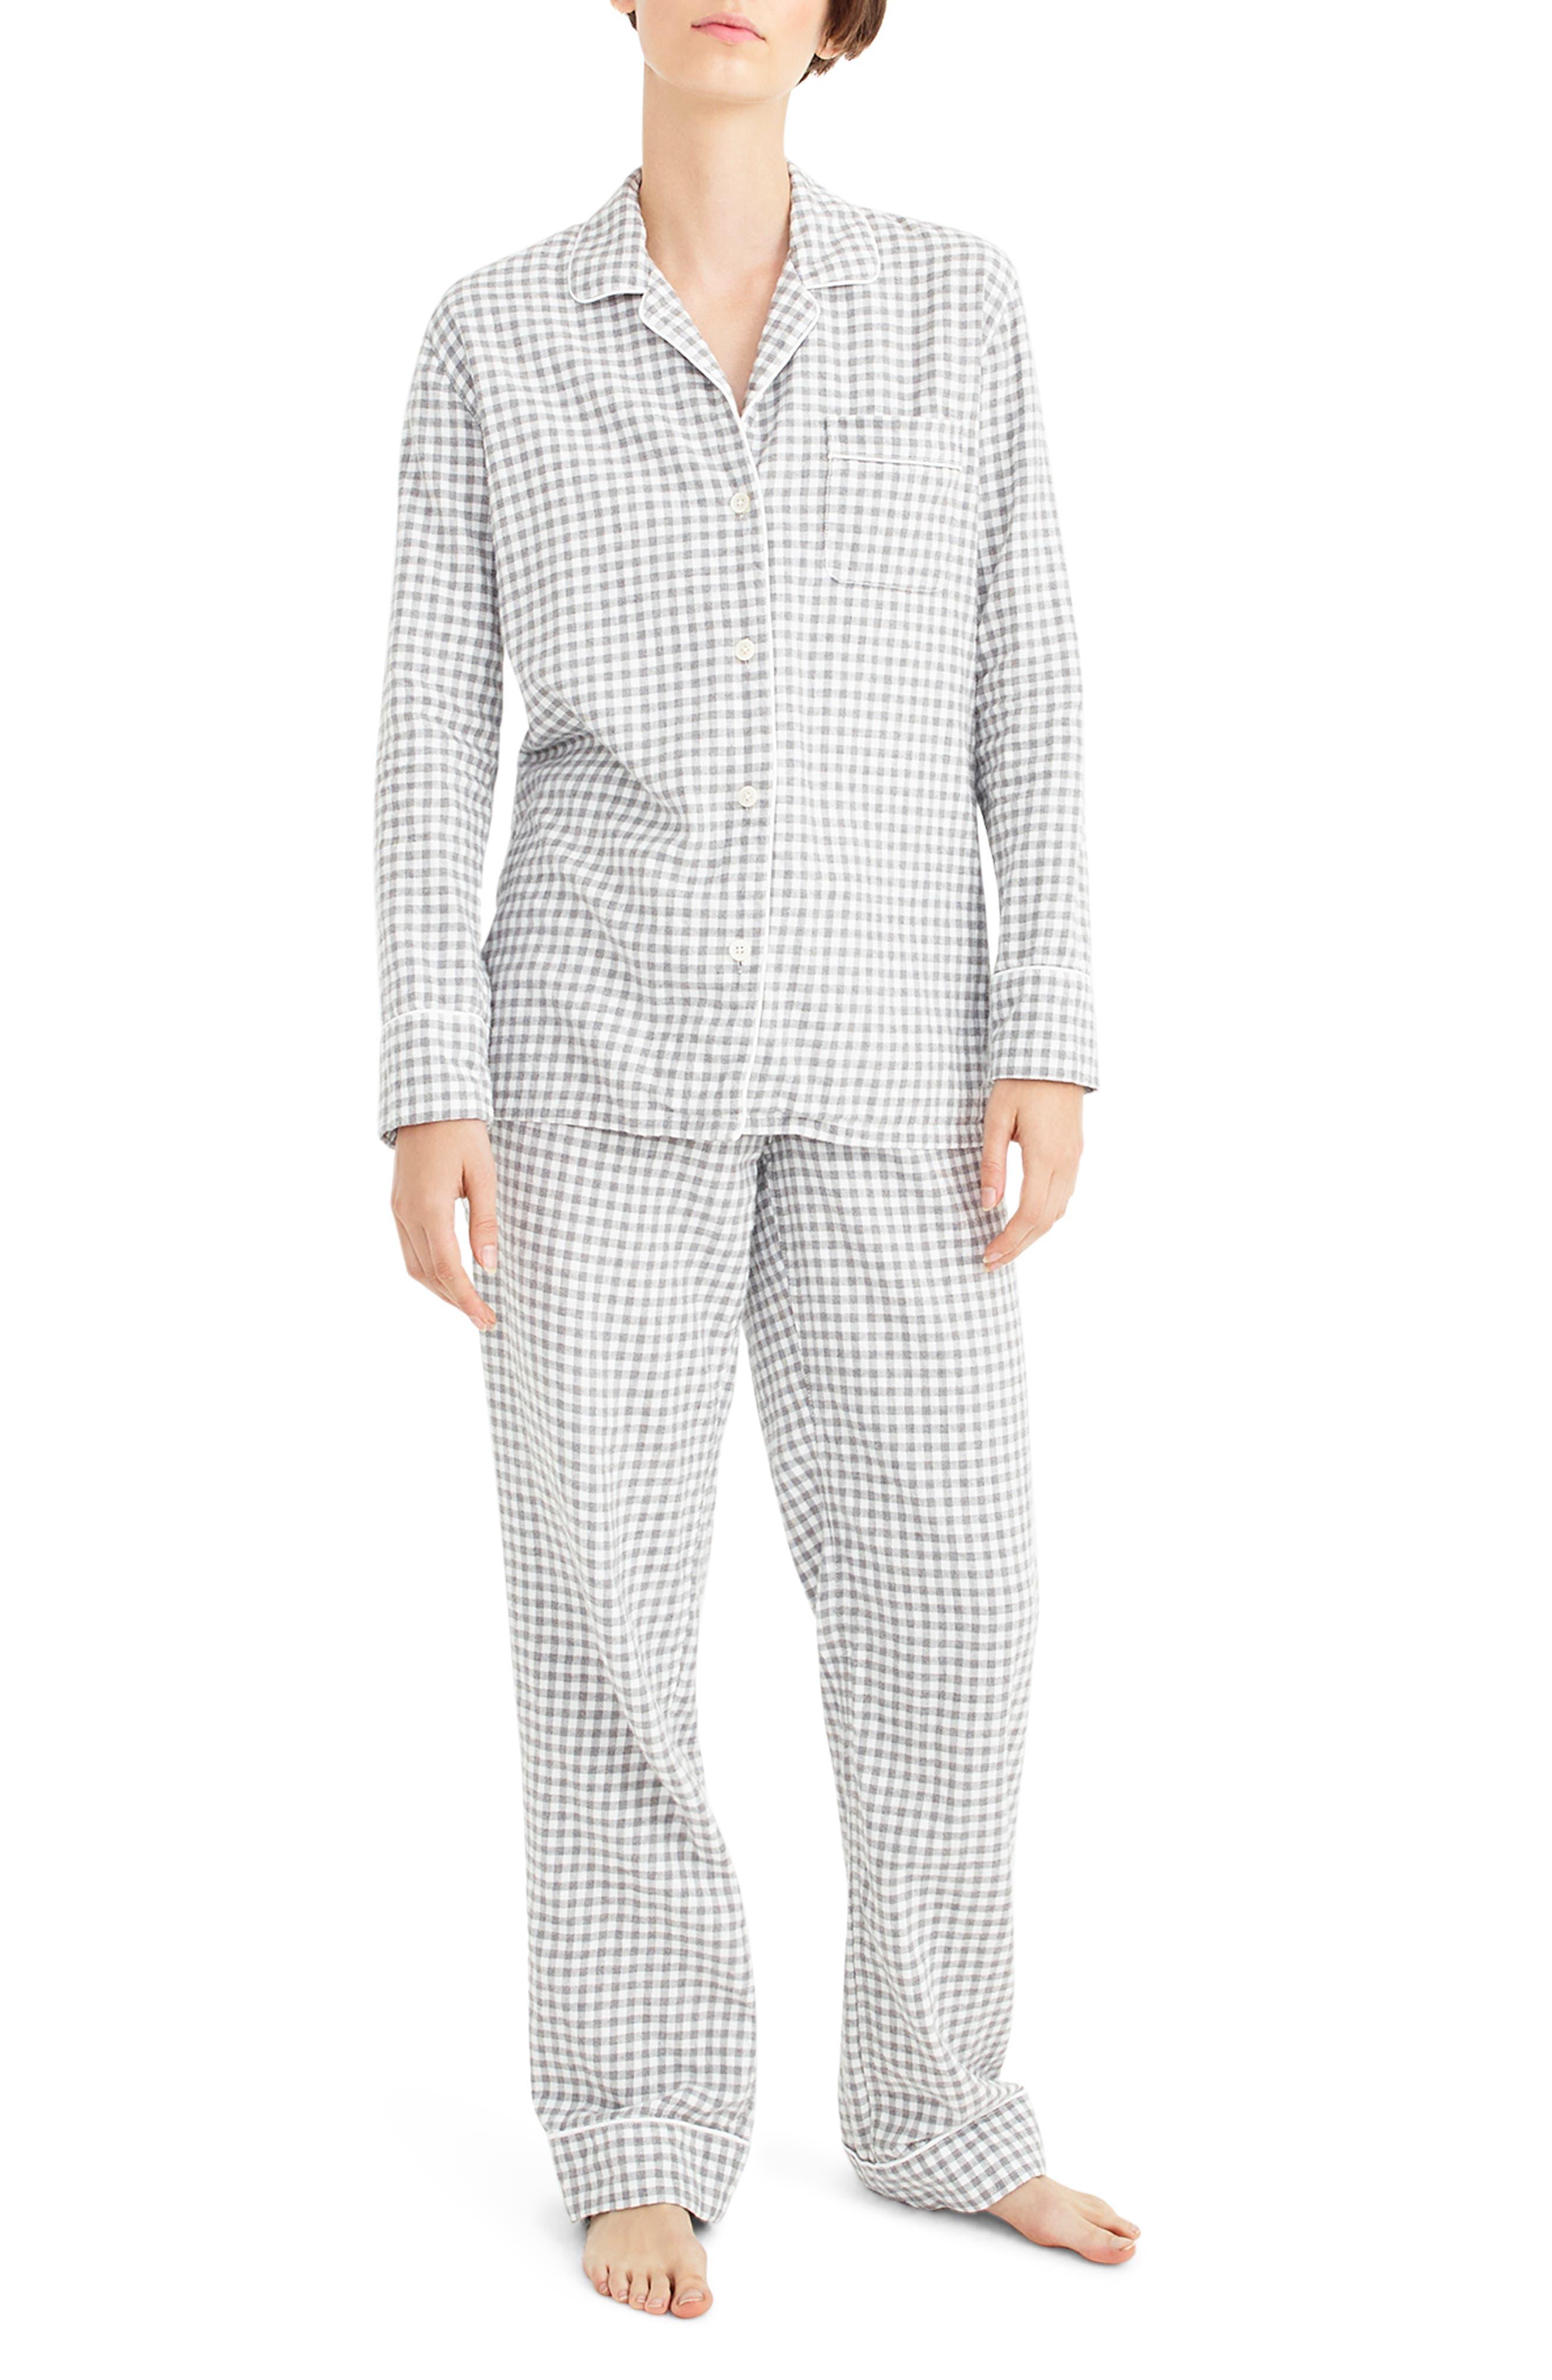 Gingham Flannel Pajamas,                             Main thumbnail 1, color,                             090